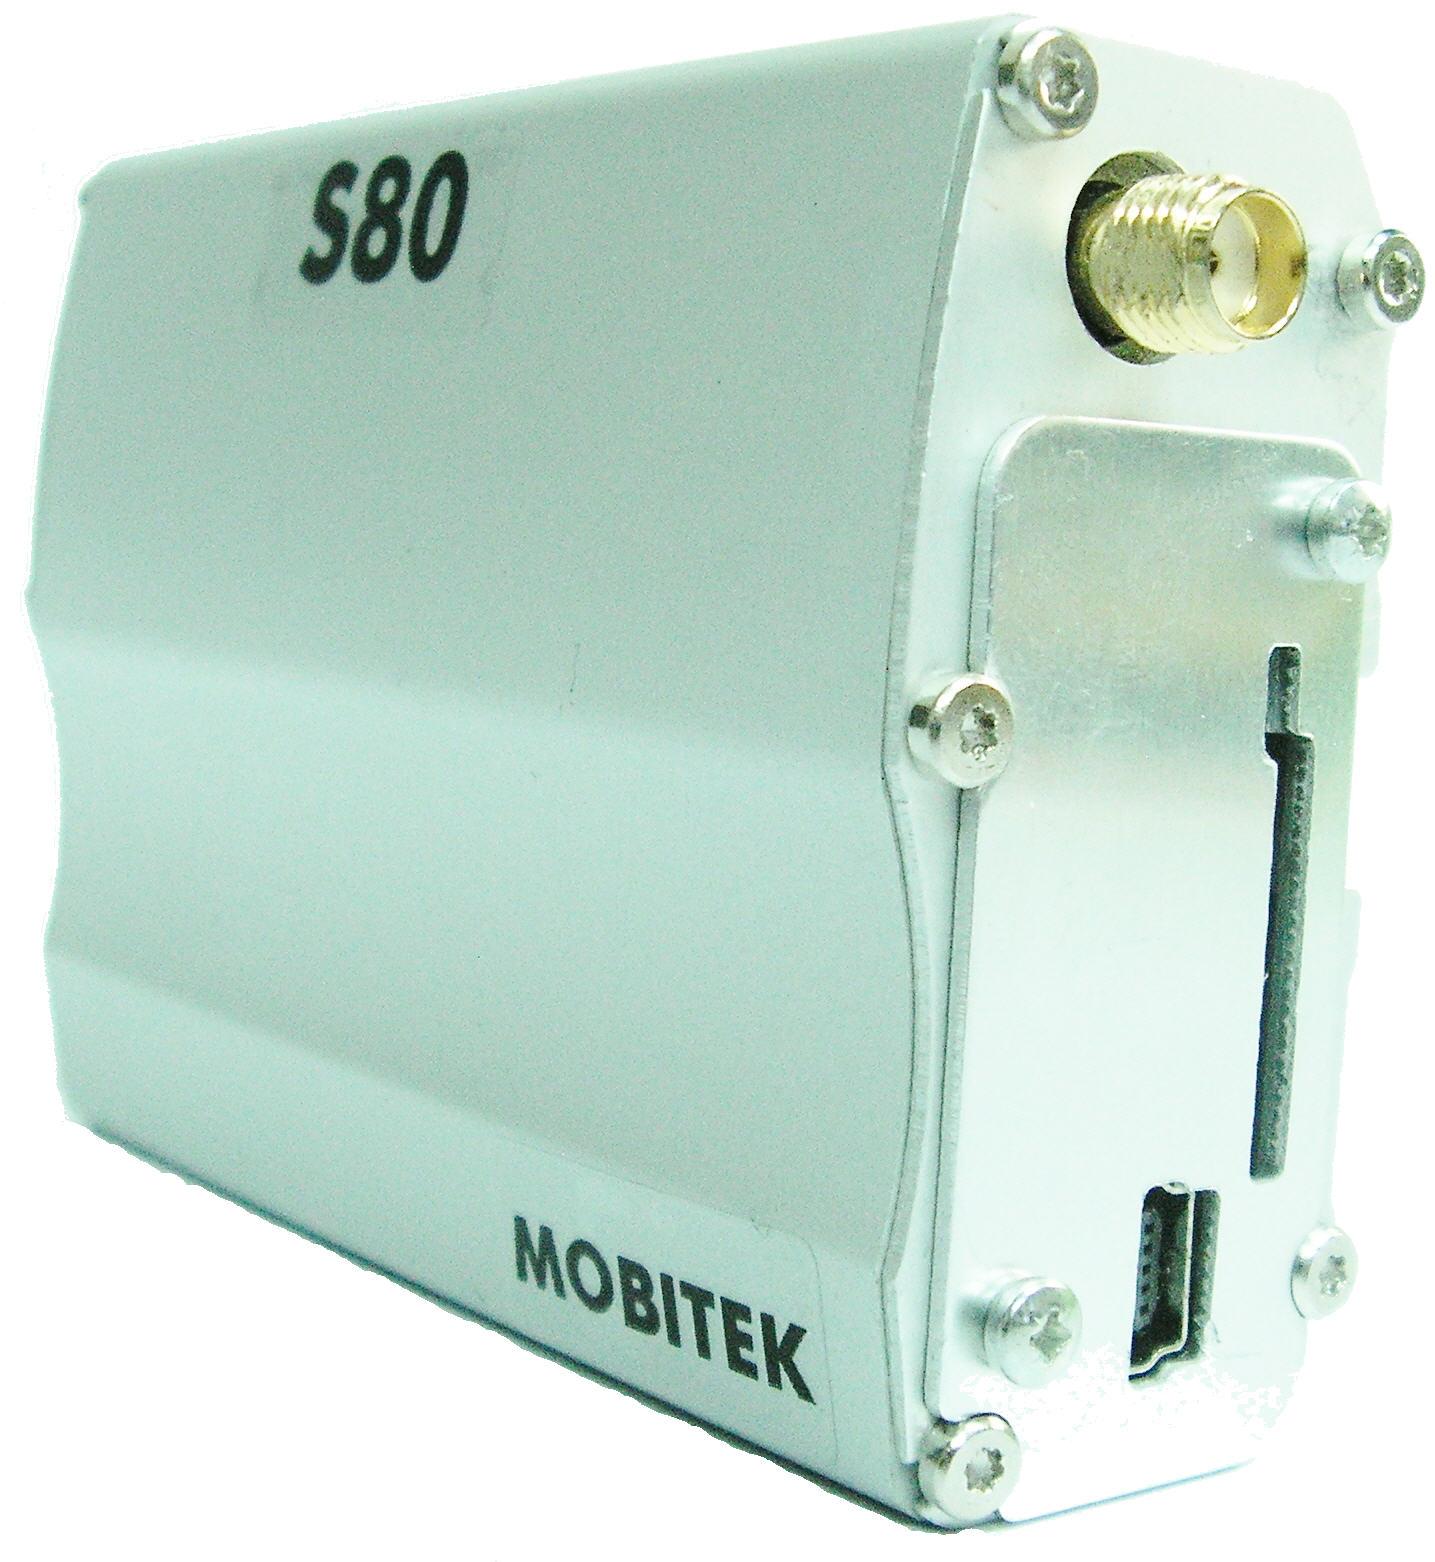 MOBITEK S80_front_stand